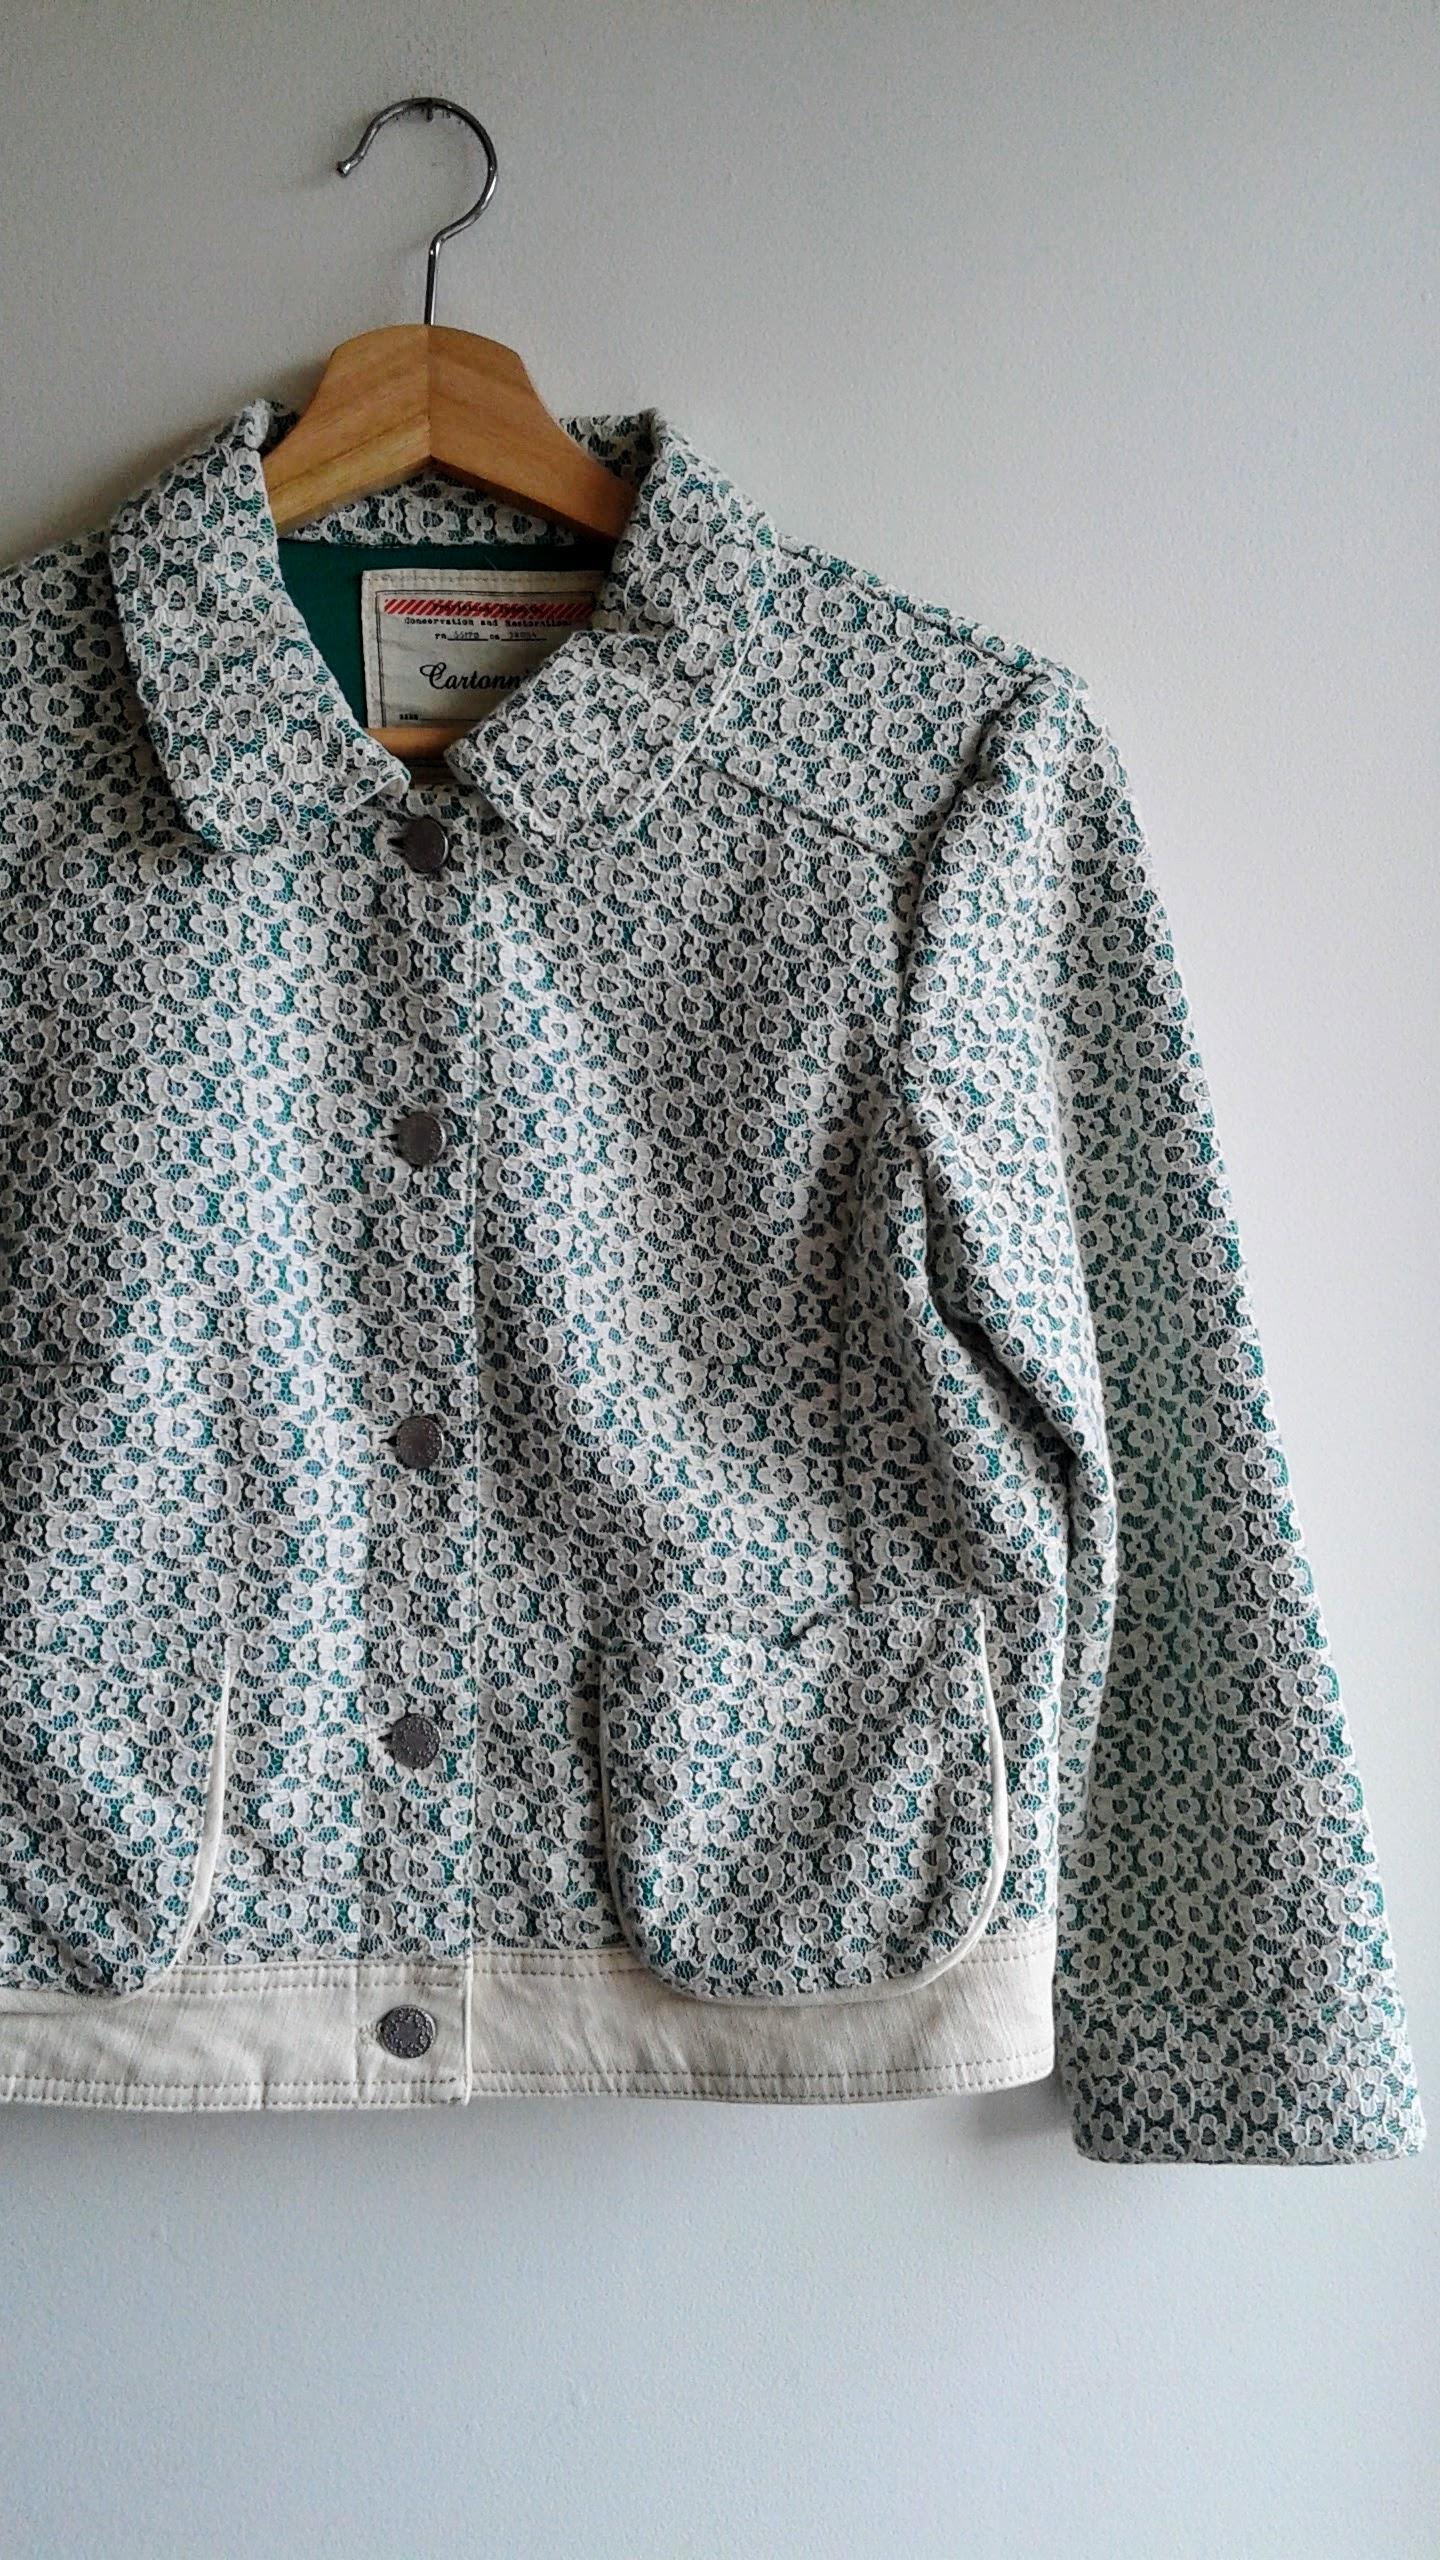 Cartonnier jacket; Size S, $52